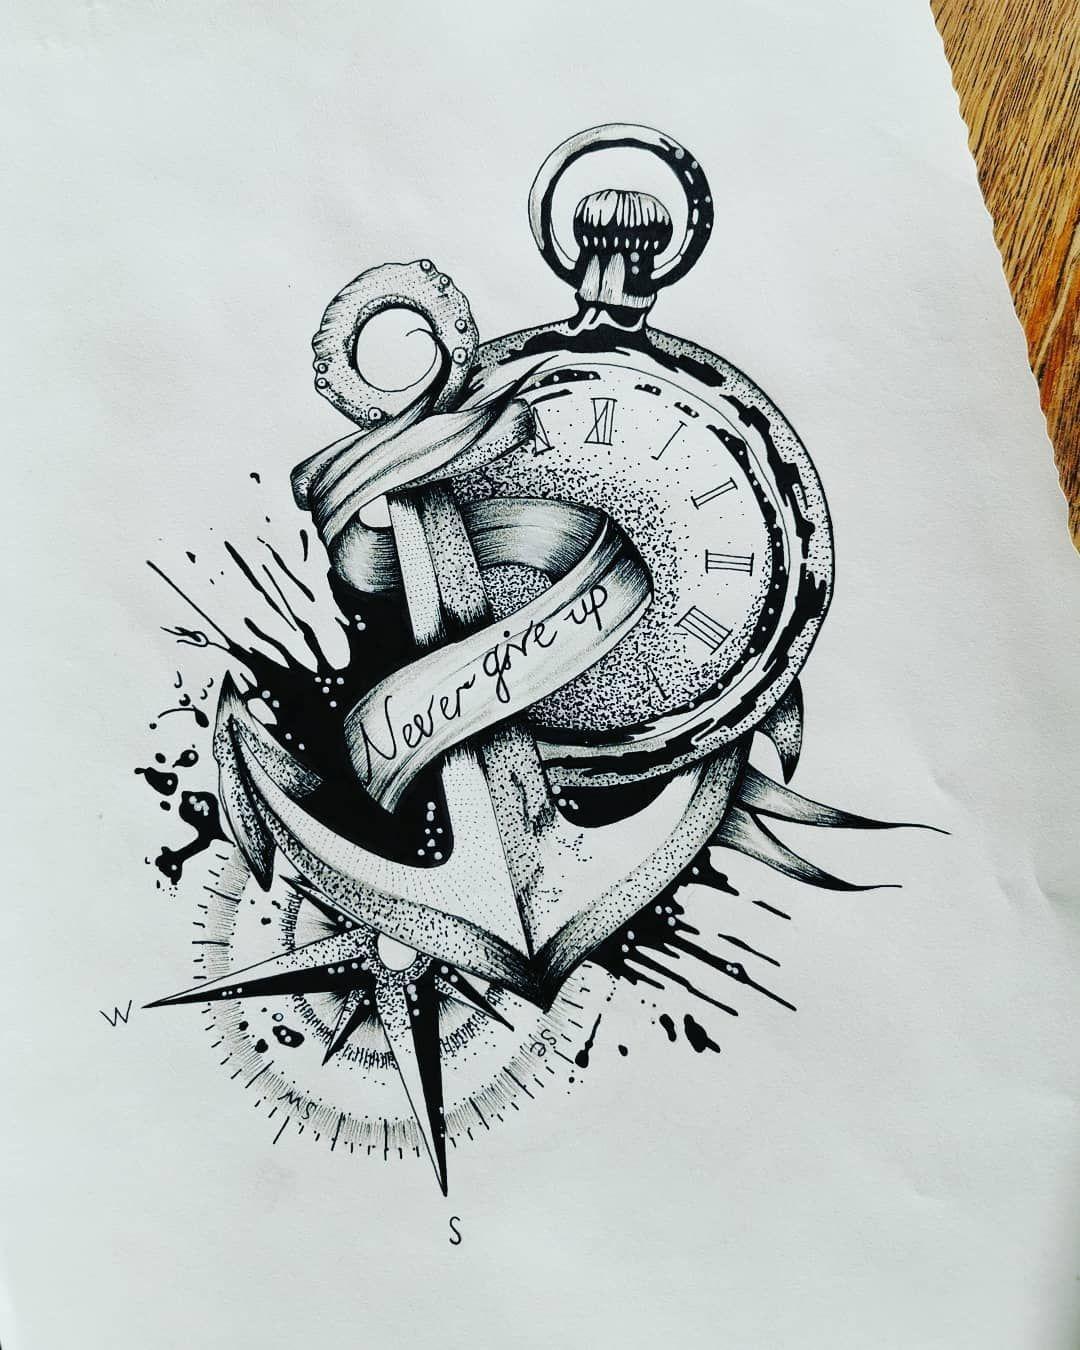 Tattoostudio Nadelstich On Instagram Tattoostudionadelstich Linework Dotwork Tattooideas Tattooins 2020 Inspiration Tattoos Dovme Tasarimlari Erkek Dovmeleri